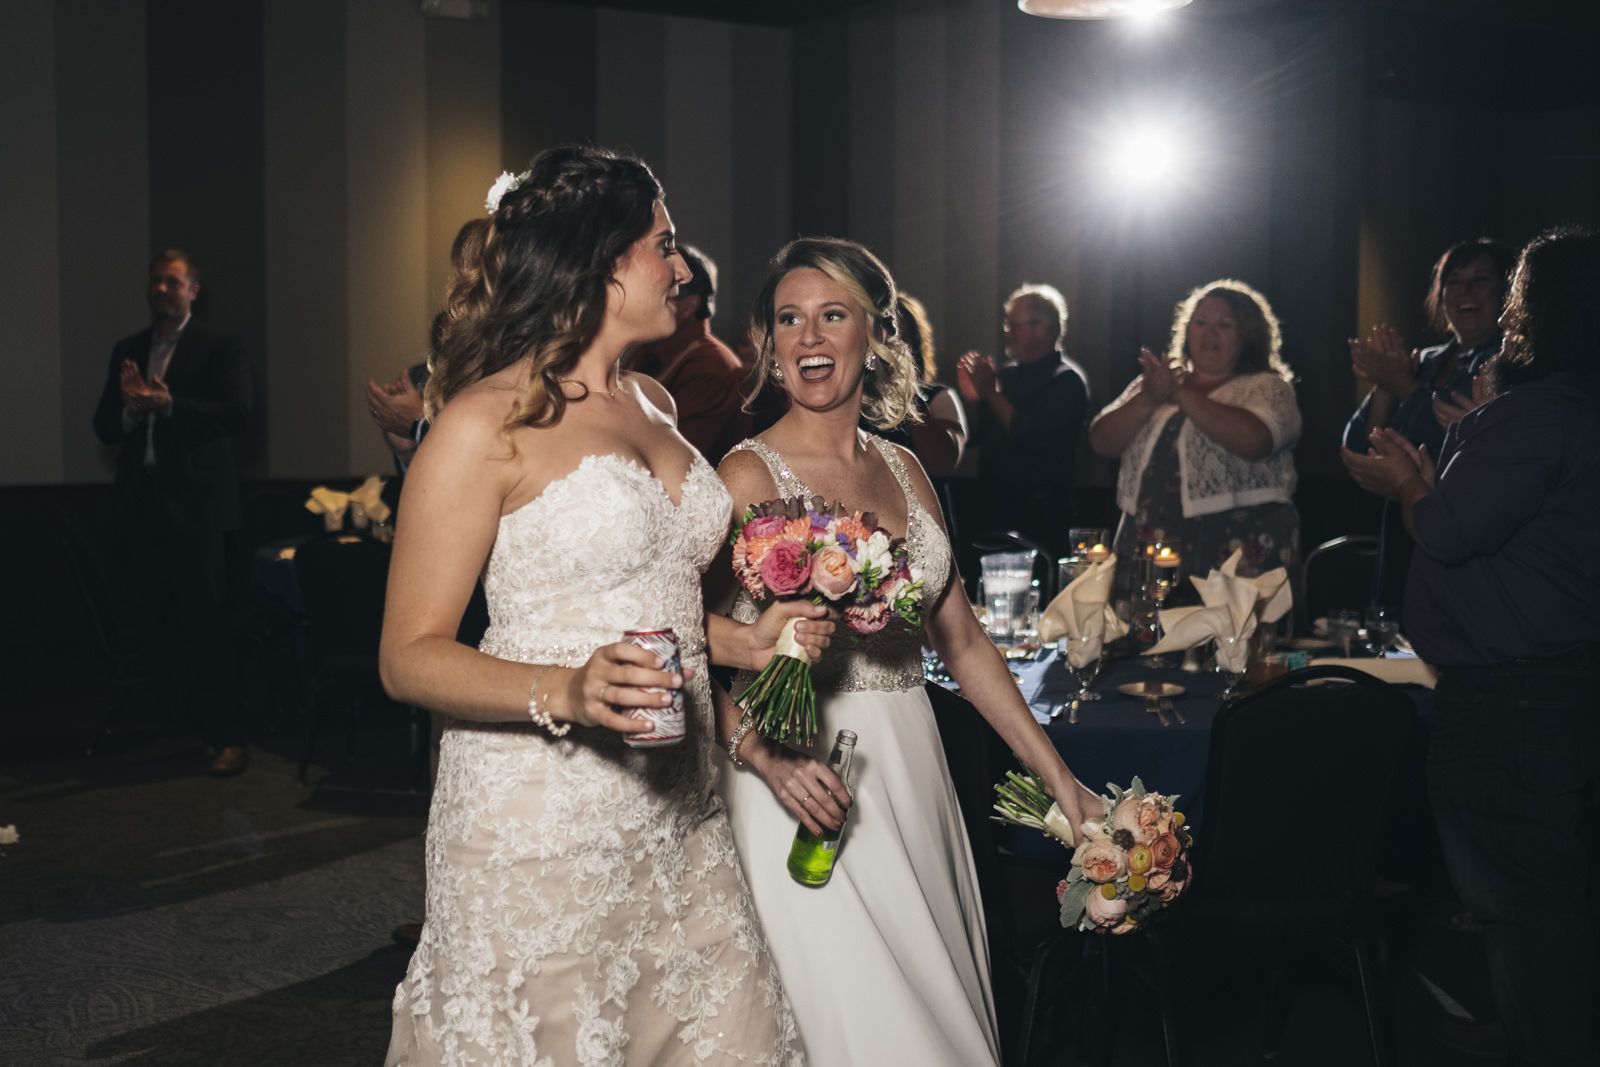 Brides enter their reception at The Premier in Toledo, Ohio.